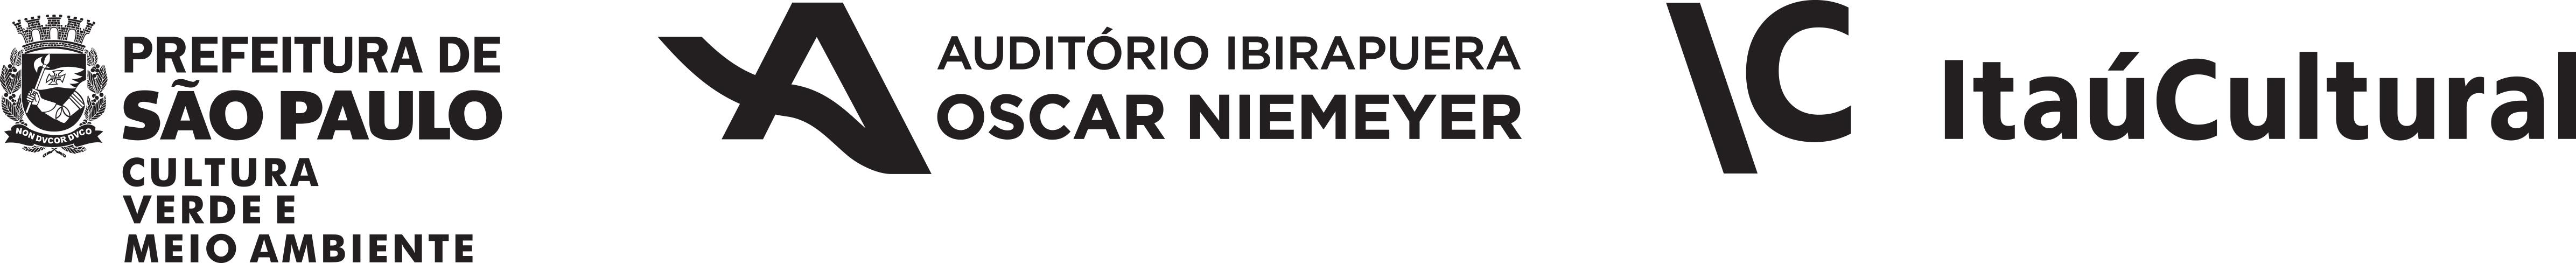 Prefeitura de São Paulo - Auditório Ibirapuera - Itaú Cultural